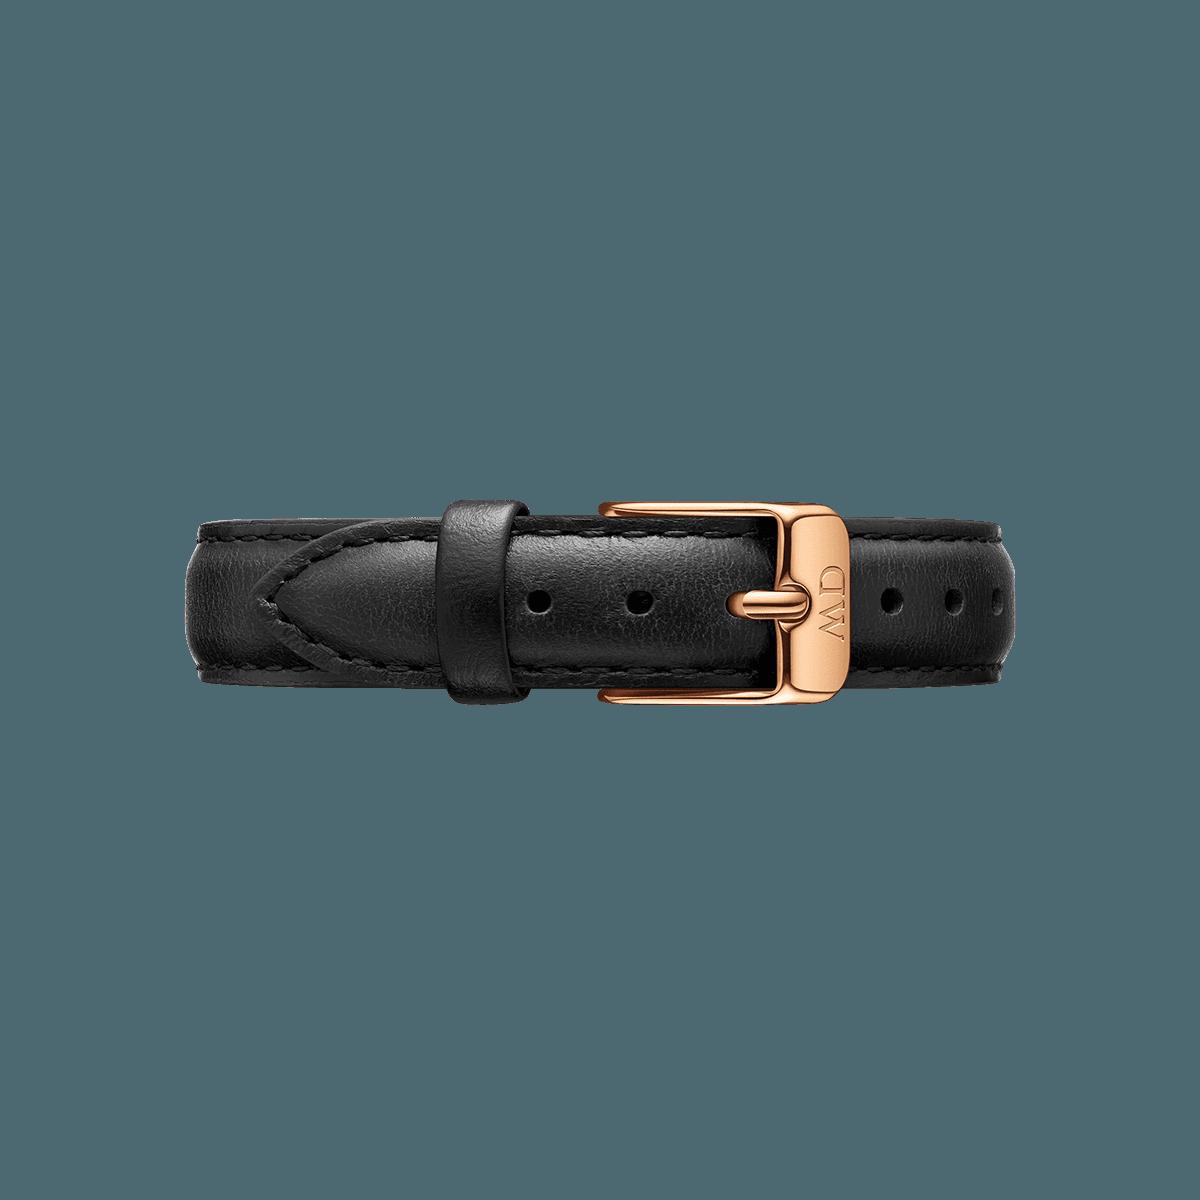 dw官网 dw手表官网 dw中国官网 dw官方旗舰店 DW DW官网   Watch band Petite RG 12mm Sheffield